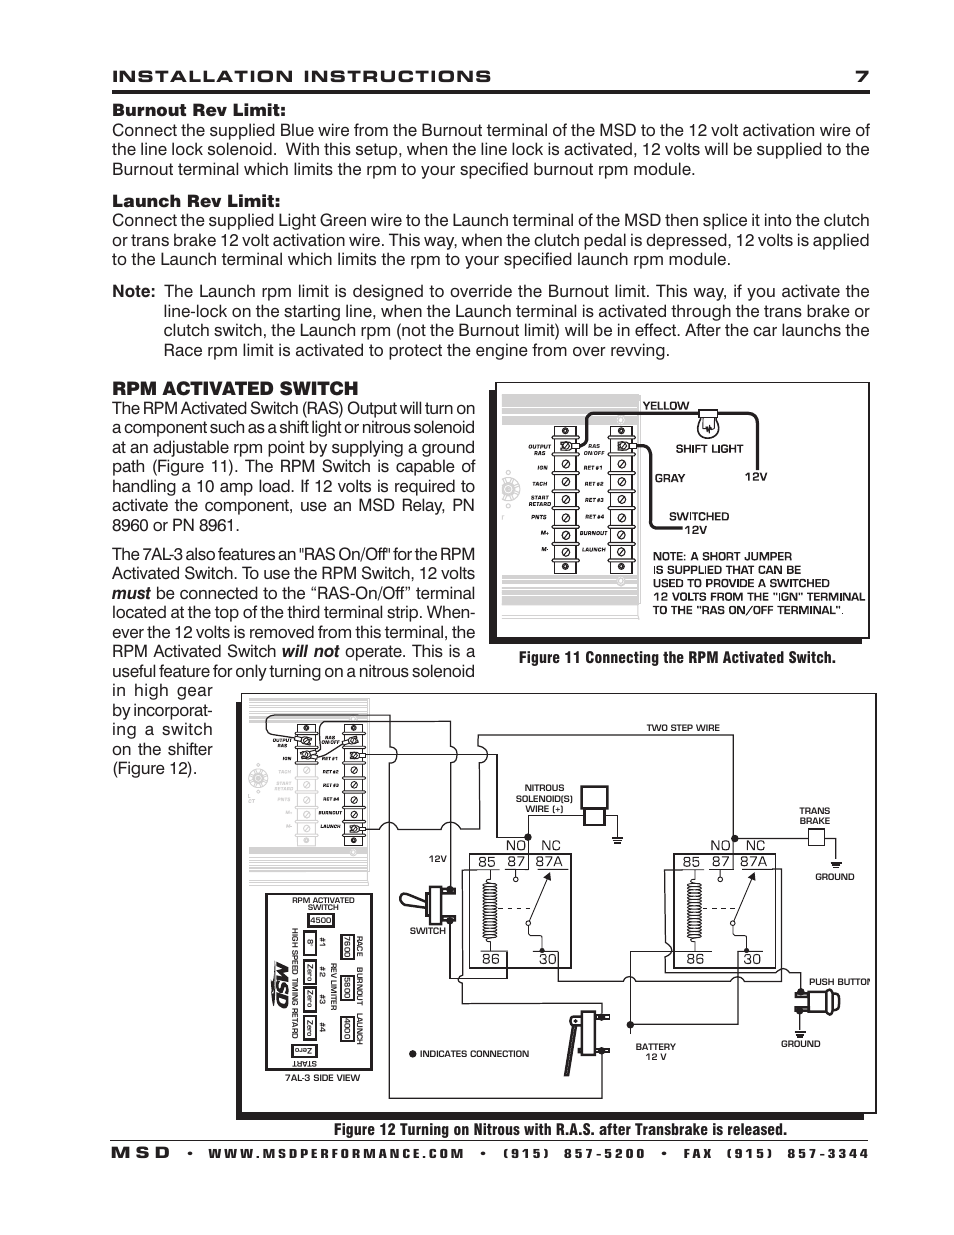 Nitrous Trans Ke Wiring Diagram 2000 Honda Odyssey Fuse Diagram on